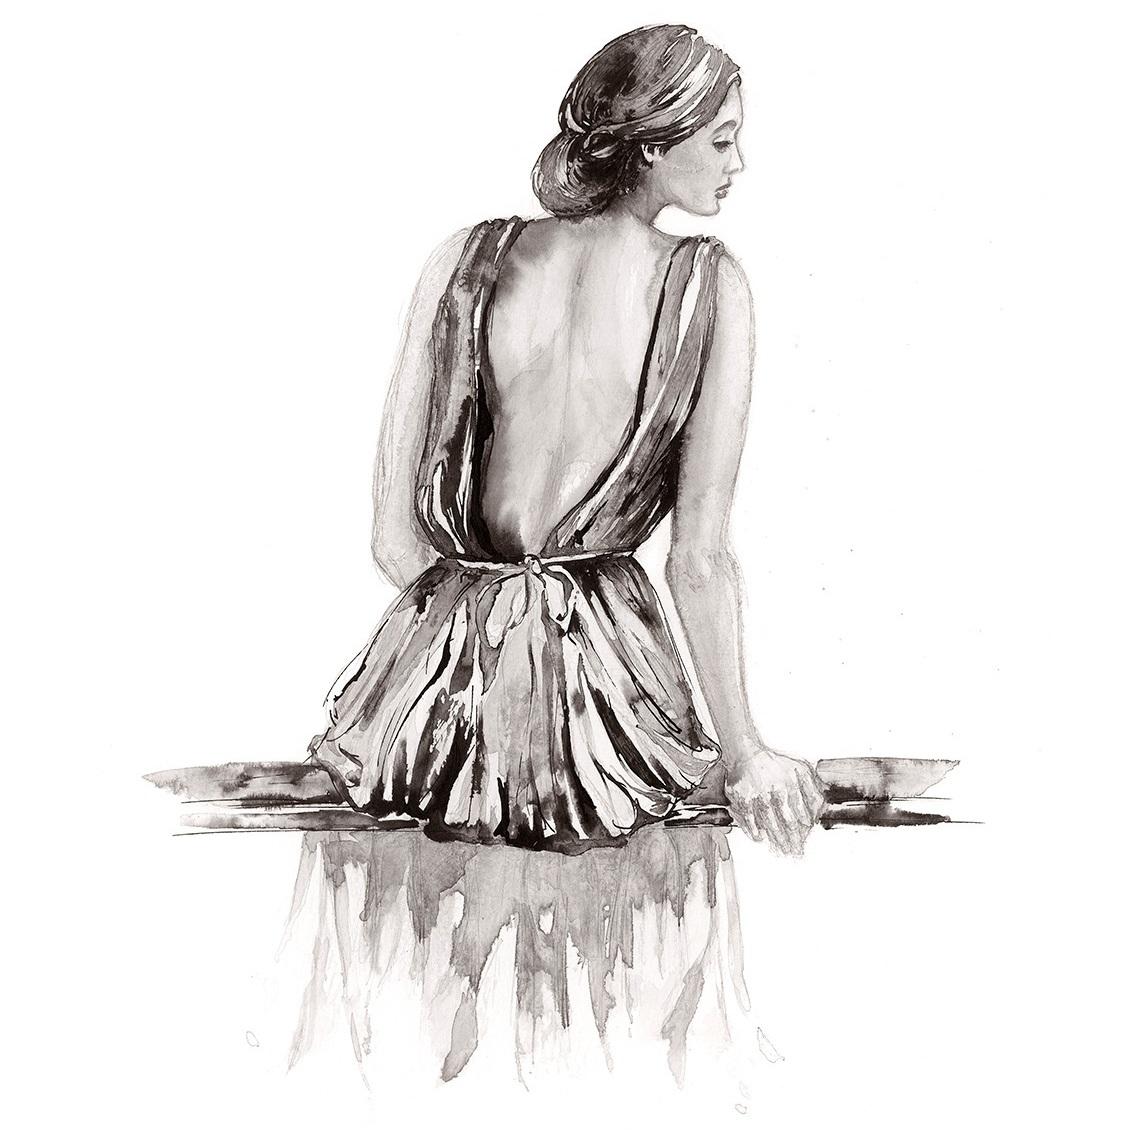 'Morning Light'.  Fine Art Print by Artist, Dana Trijbetz.  Original Ink Painting made as a Giclée Print on 100% Cotton Paper.  Image 2 of 4.jpg